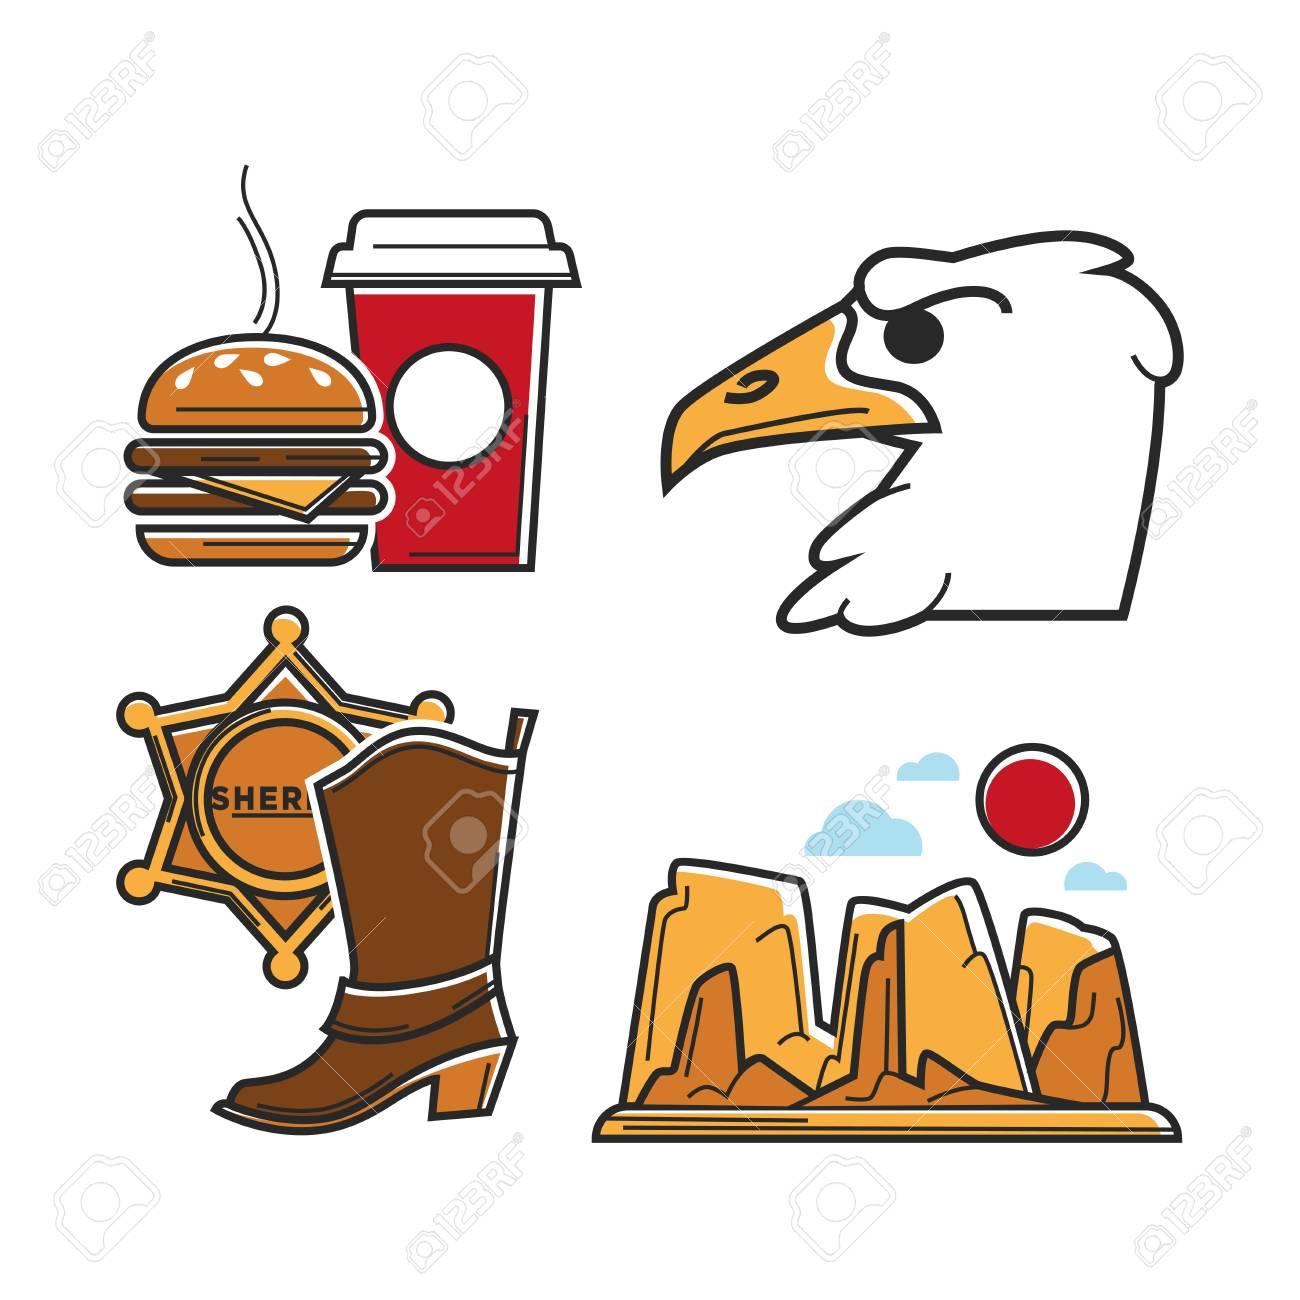 Usa Tourism Travel Or America Culture Symbols Of Famous Tourist